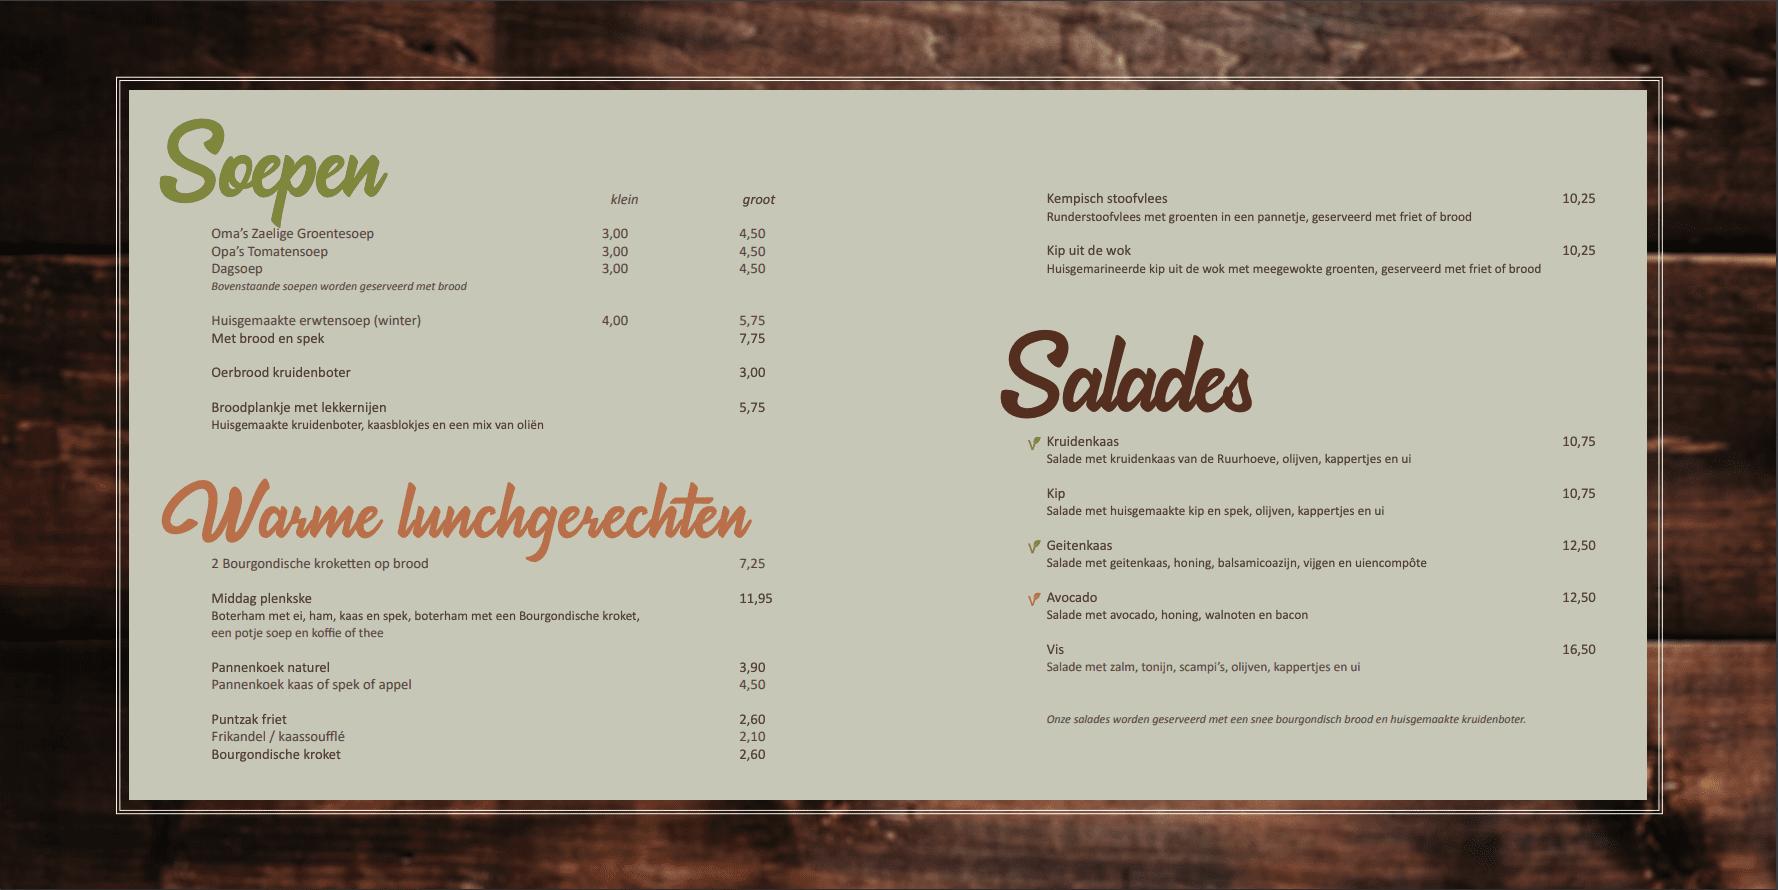 Lunchkaart soepen, warm en salades